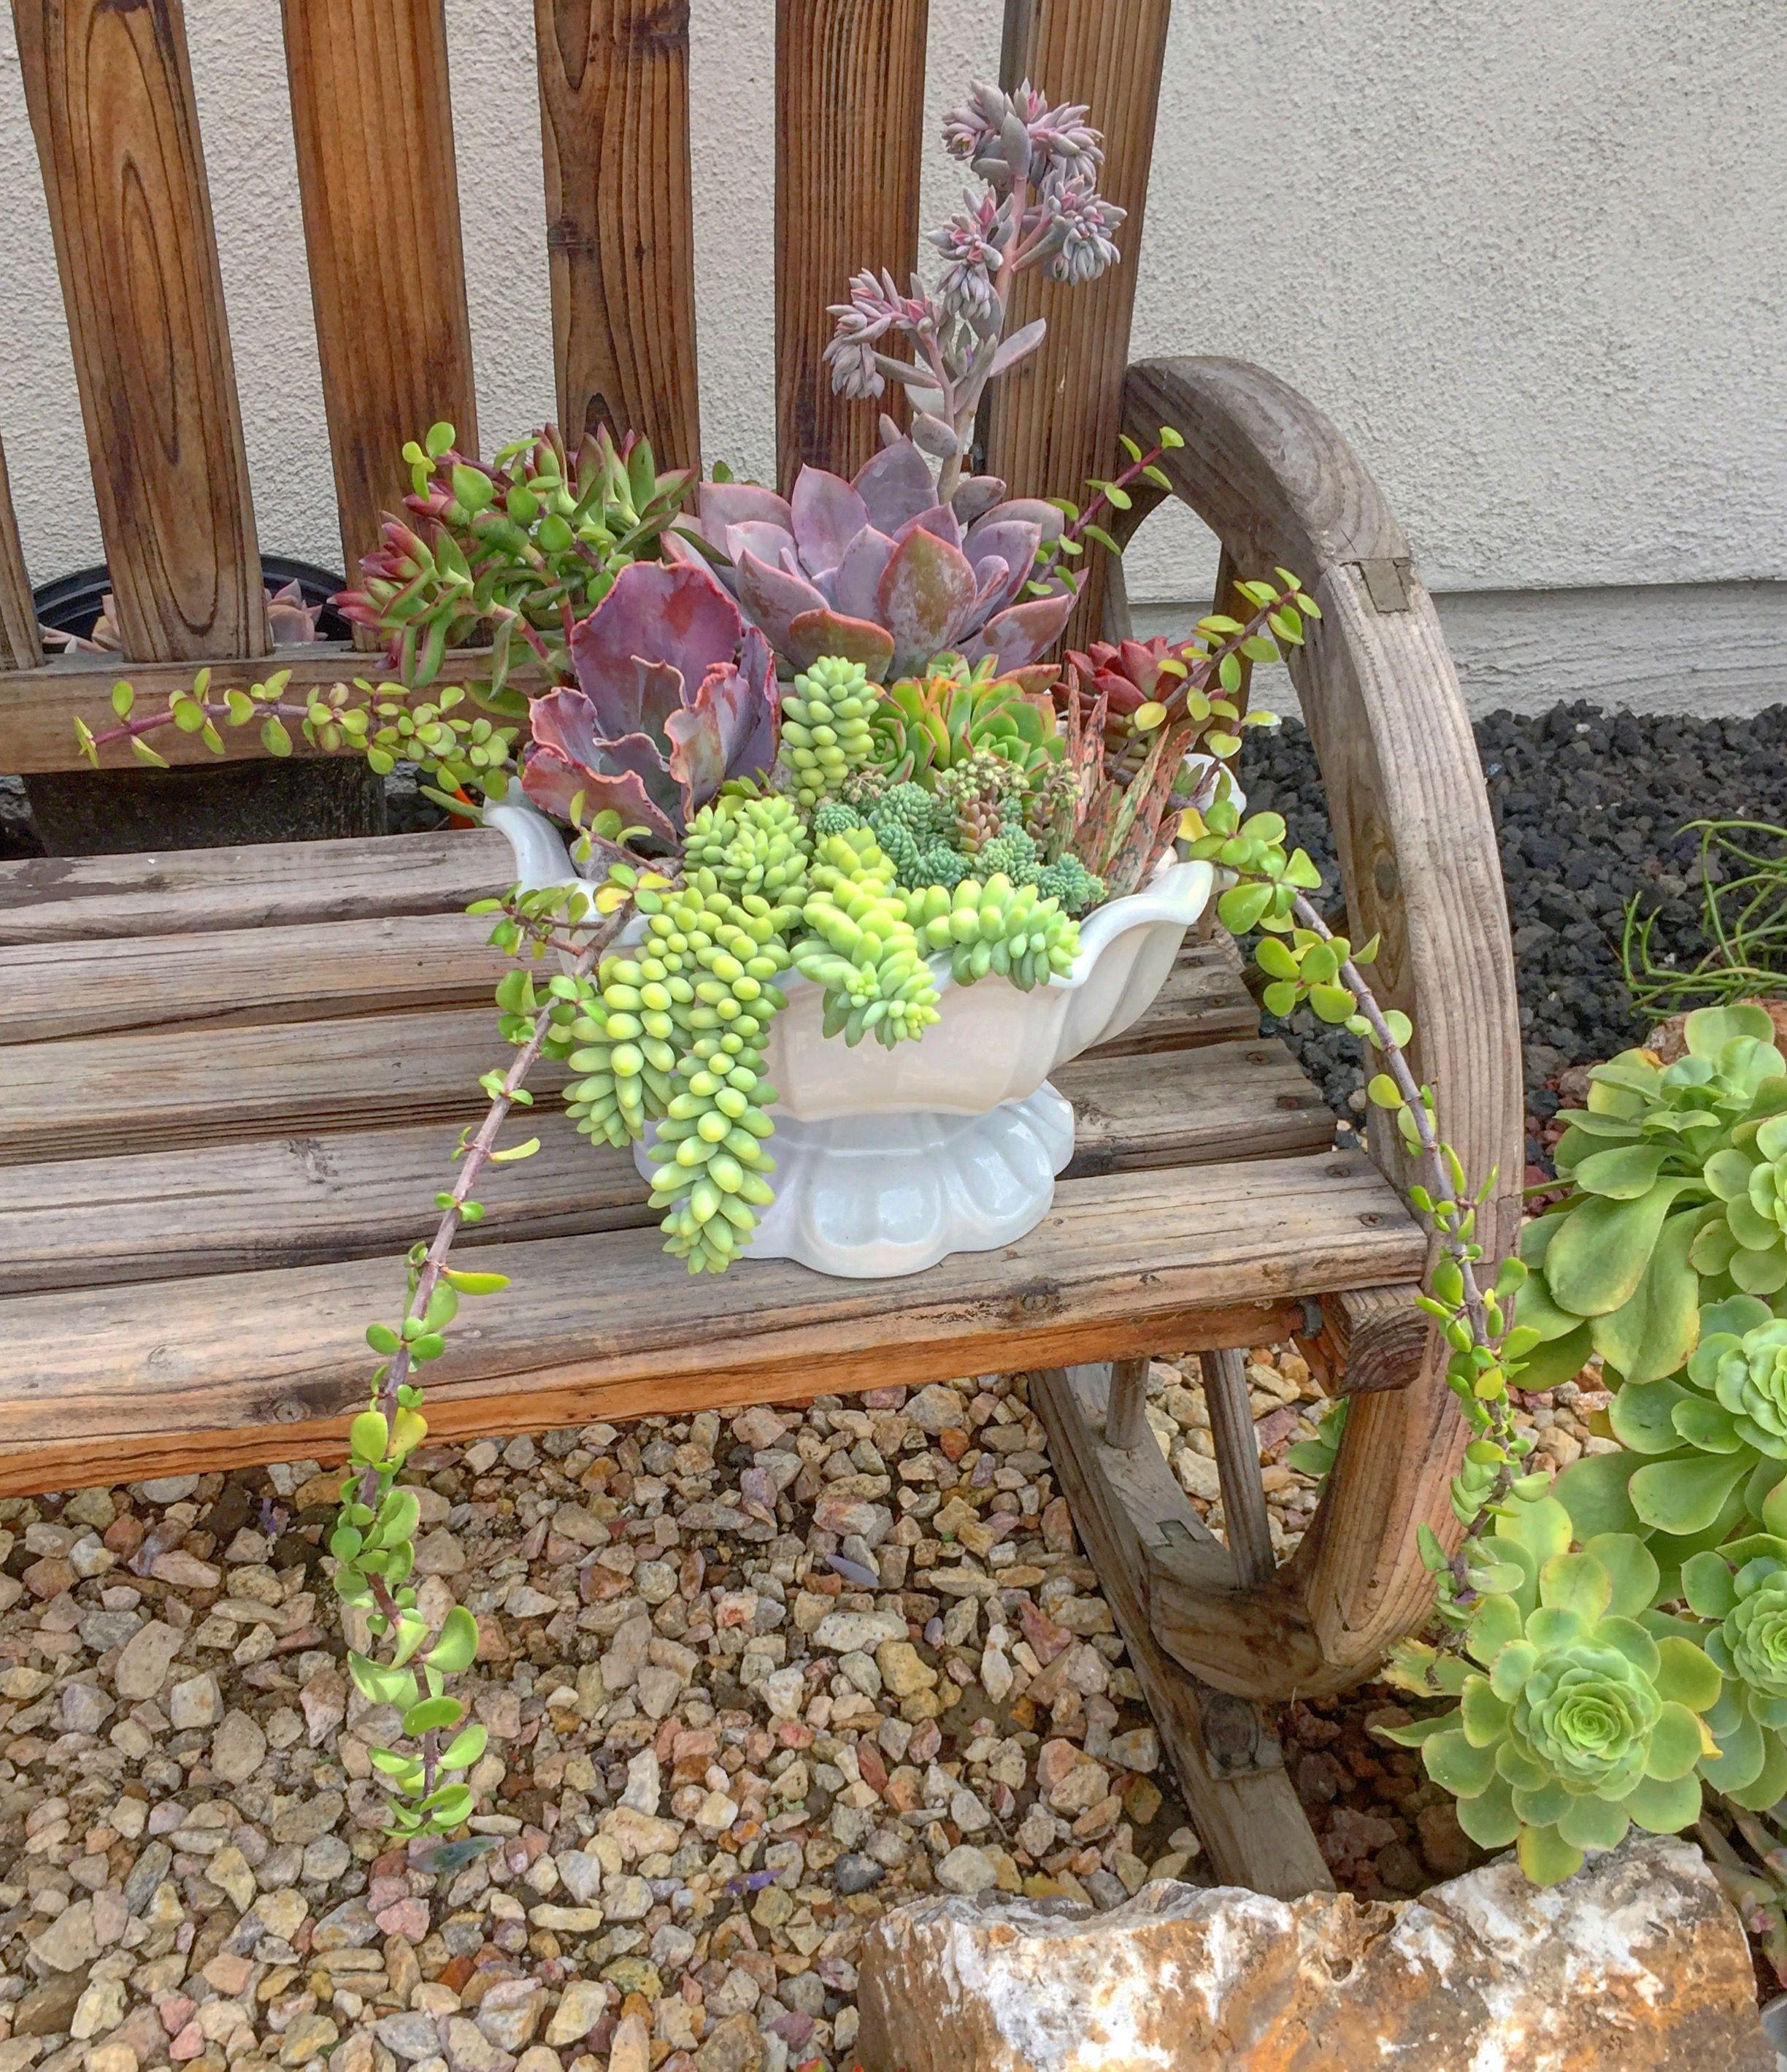 DIY landscaping with succulents image by Jayr Zhel Jad